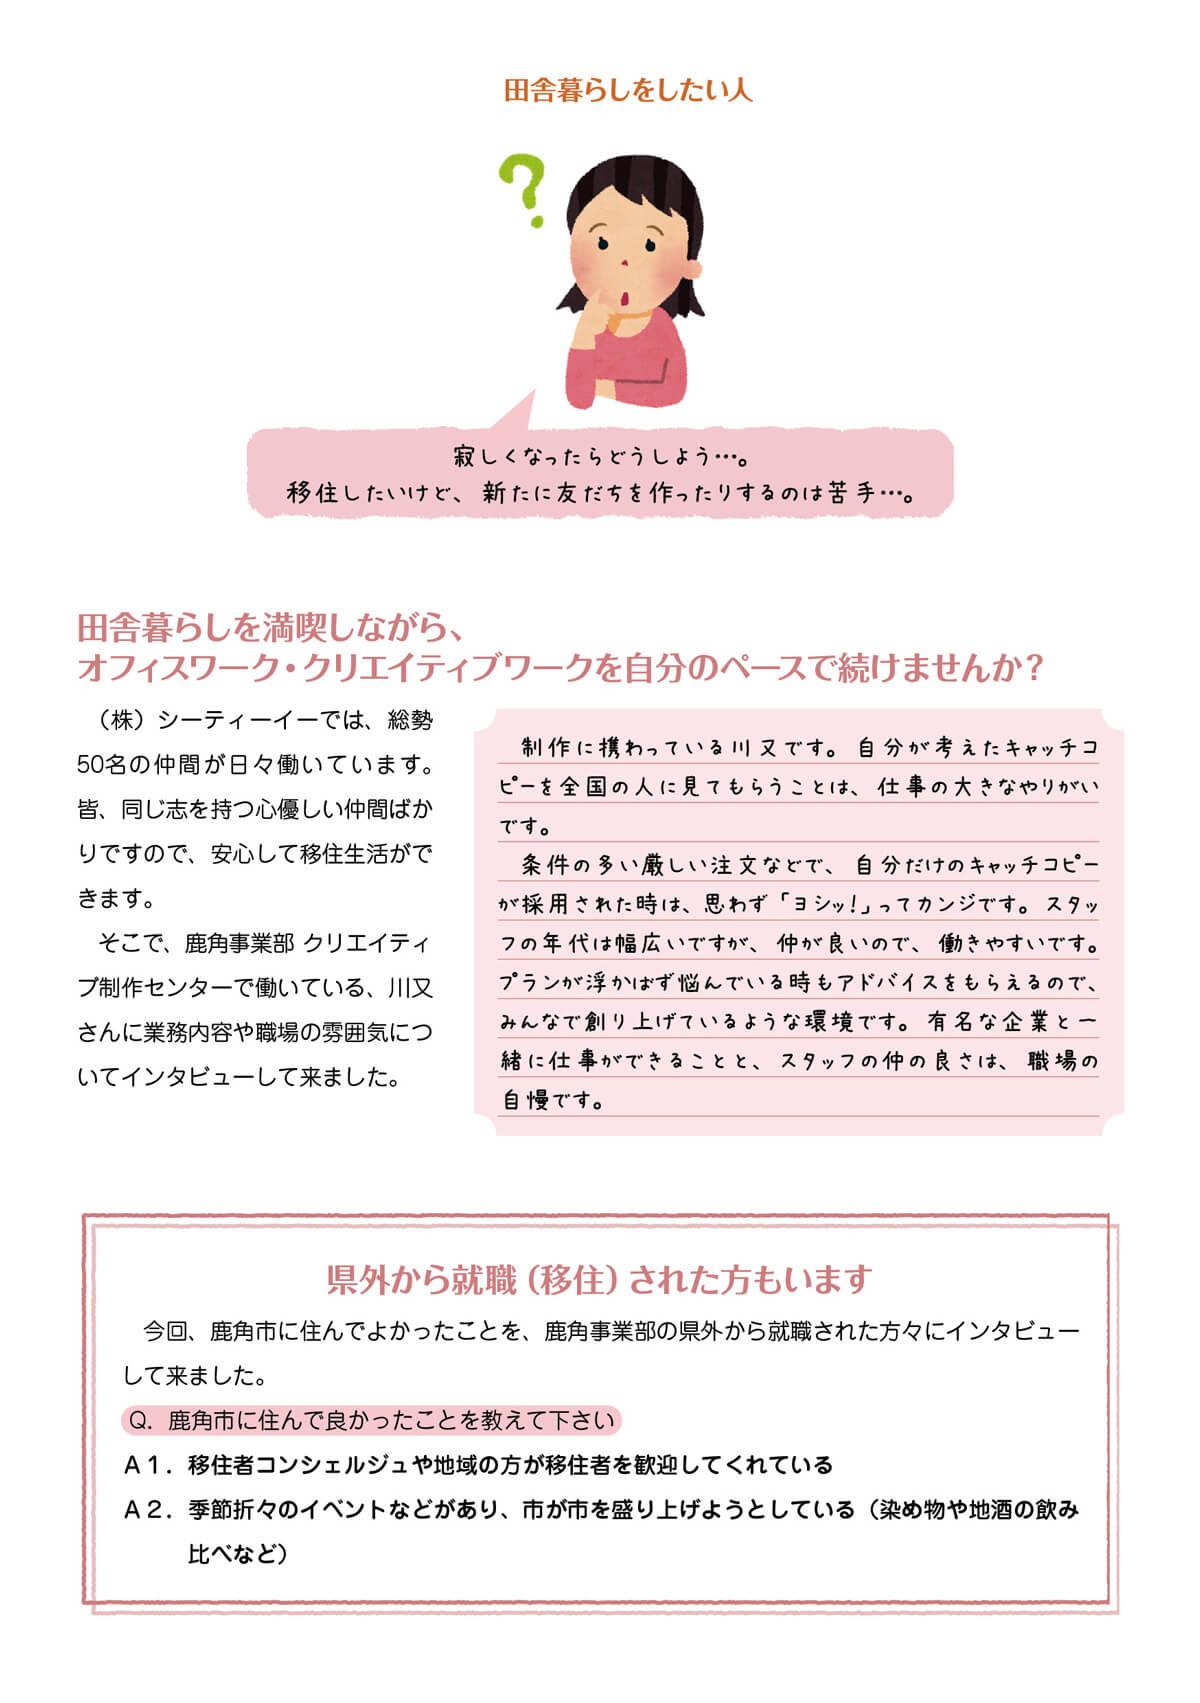 kazuno_recruit2